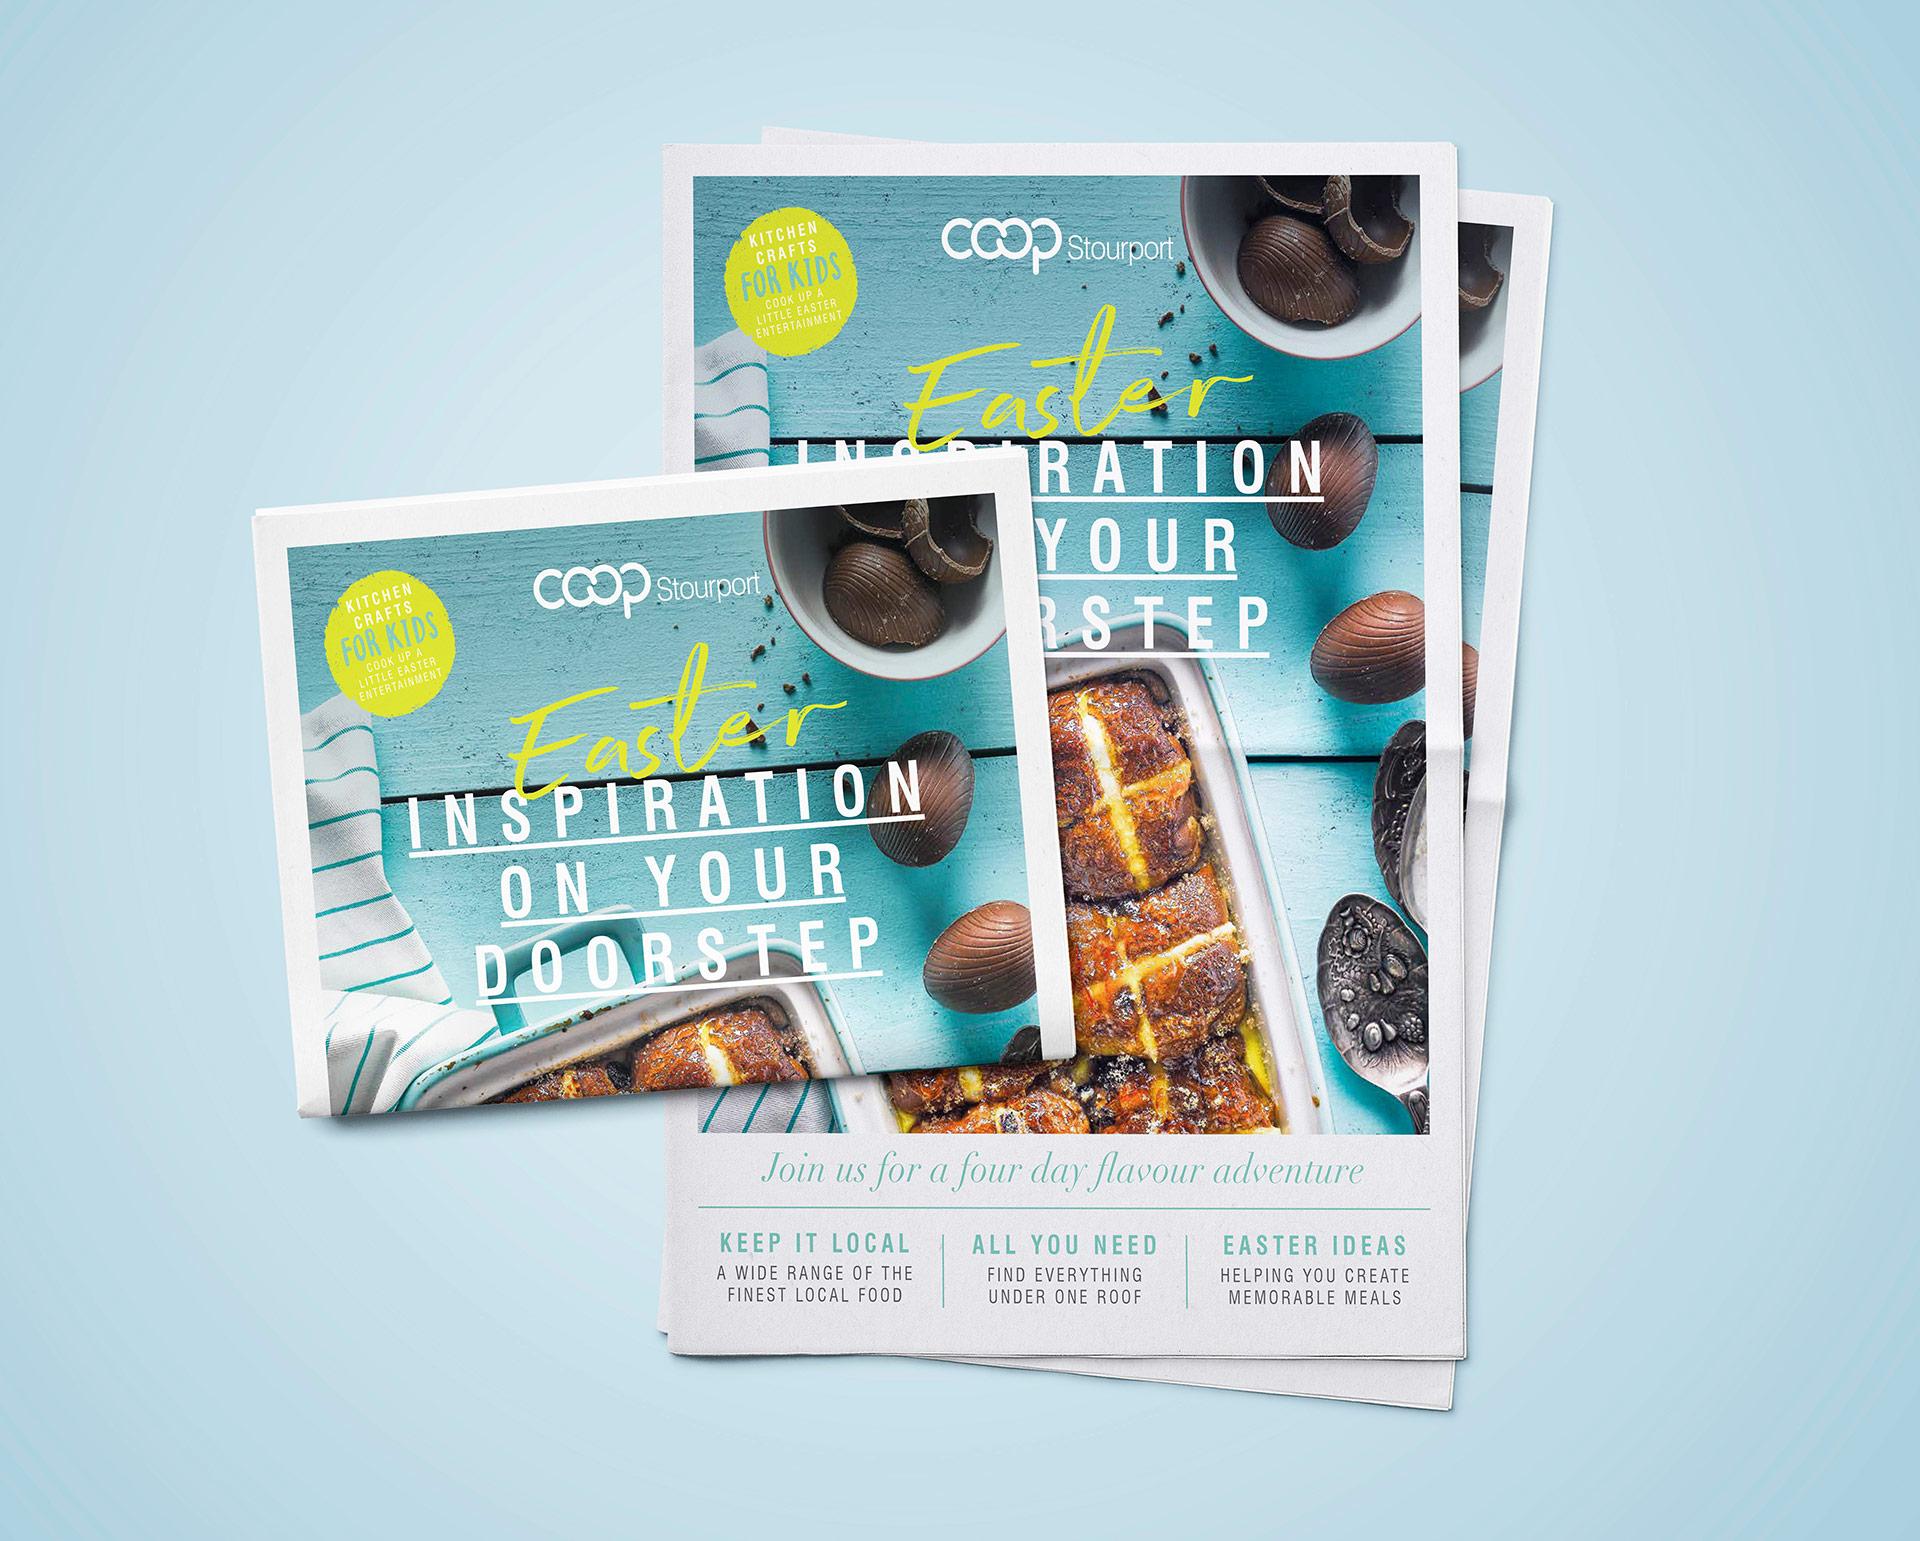 - food marketing, shopper marketing, FMCG marketing Premium goods marketing for Food and retail advertising